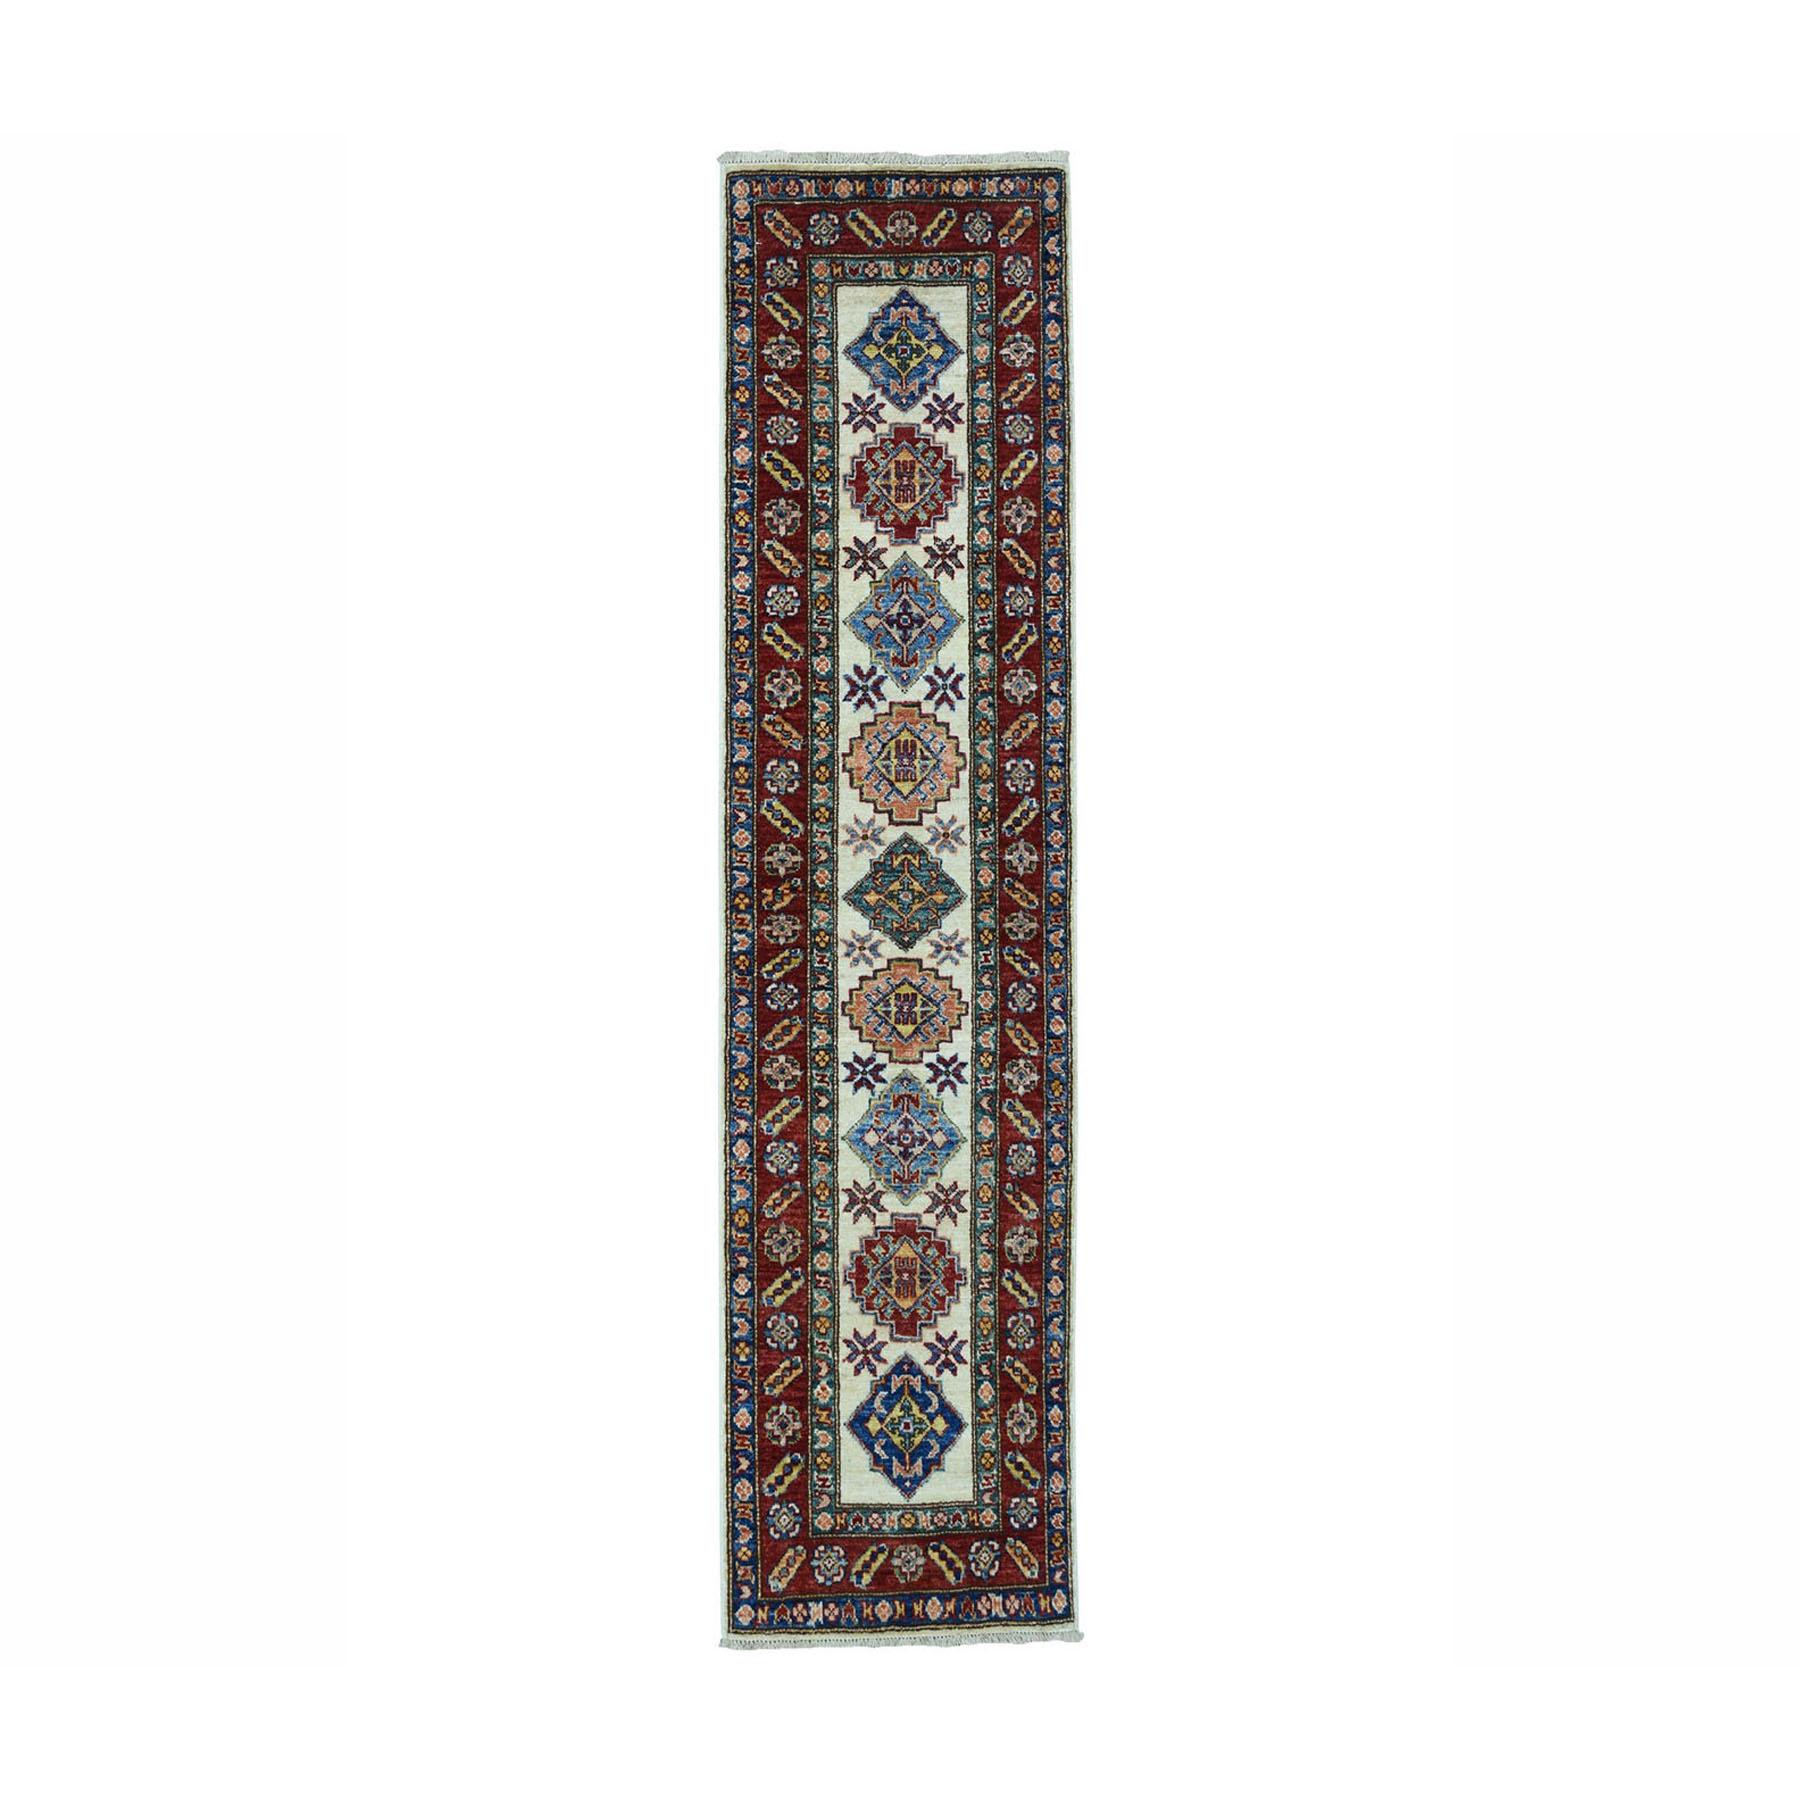 "2'X6'3"" Ivory Super Kazak Pure Wool Geometric Design Hand-Knotted Oriental Runner Rug moae0beb"